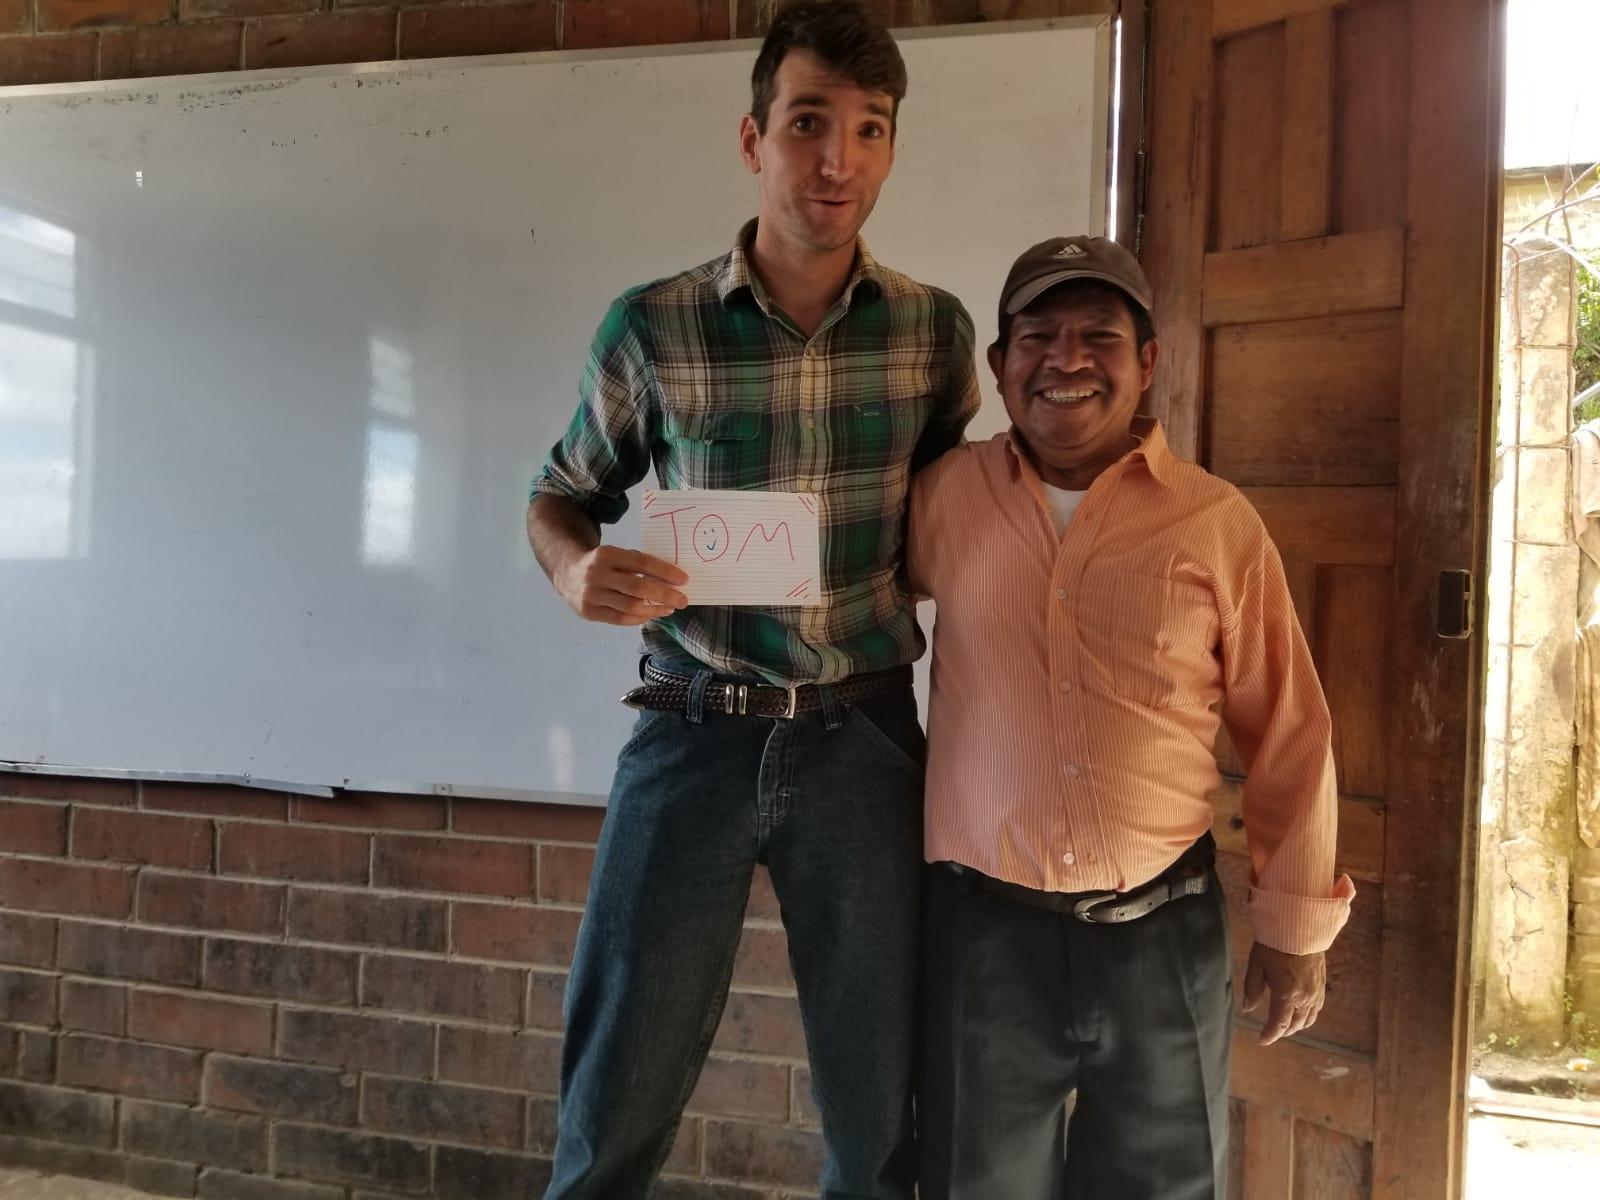 Tom and Abe.jpeg